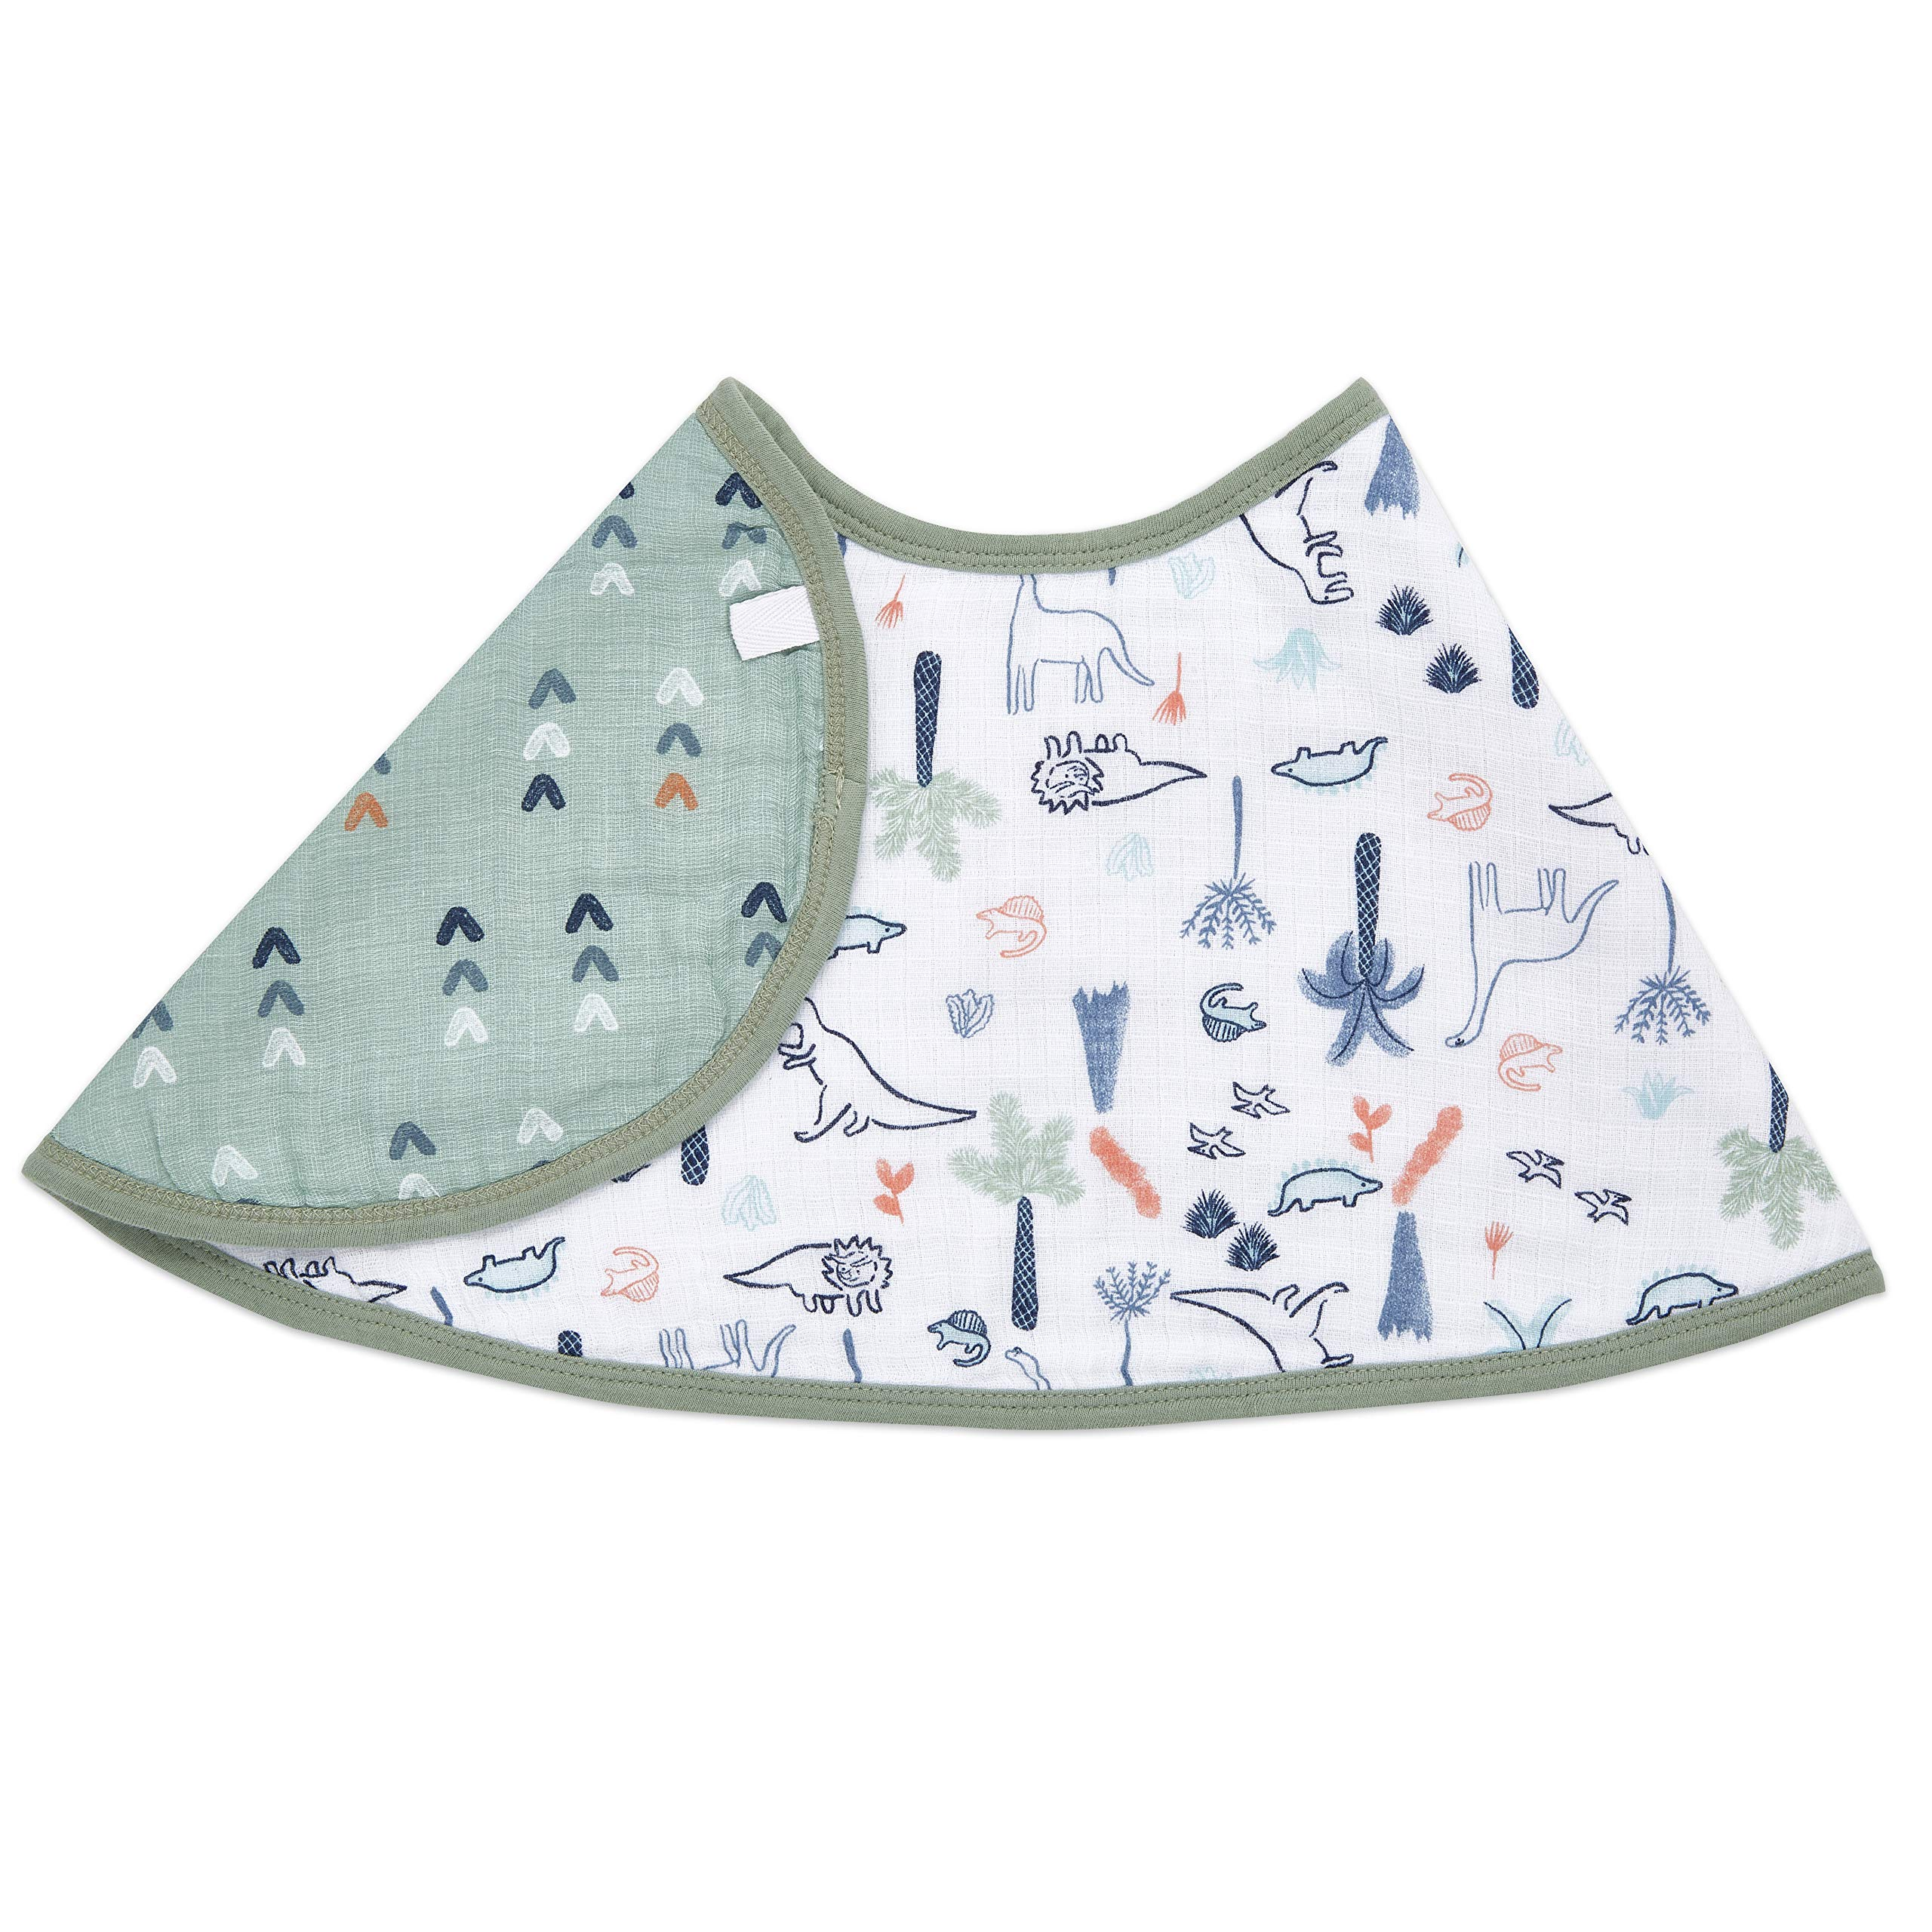 "aden + anais Burpy Baby Bib, 100% Cotton Muslin, Soft Absorbent 4 Layers, Multi-Use Burp Cloth and Bib, 22.5"" X 11"", Single, Dino Time"